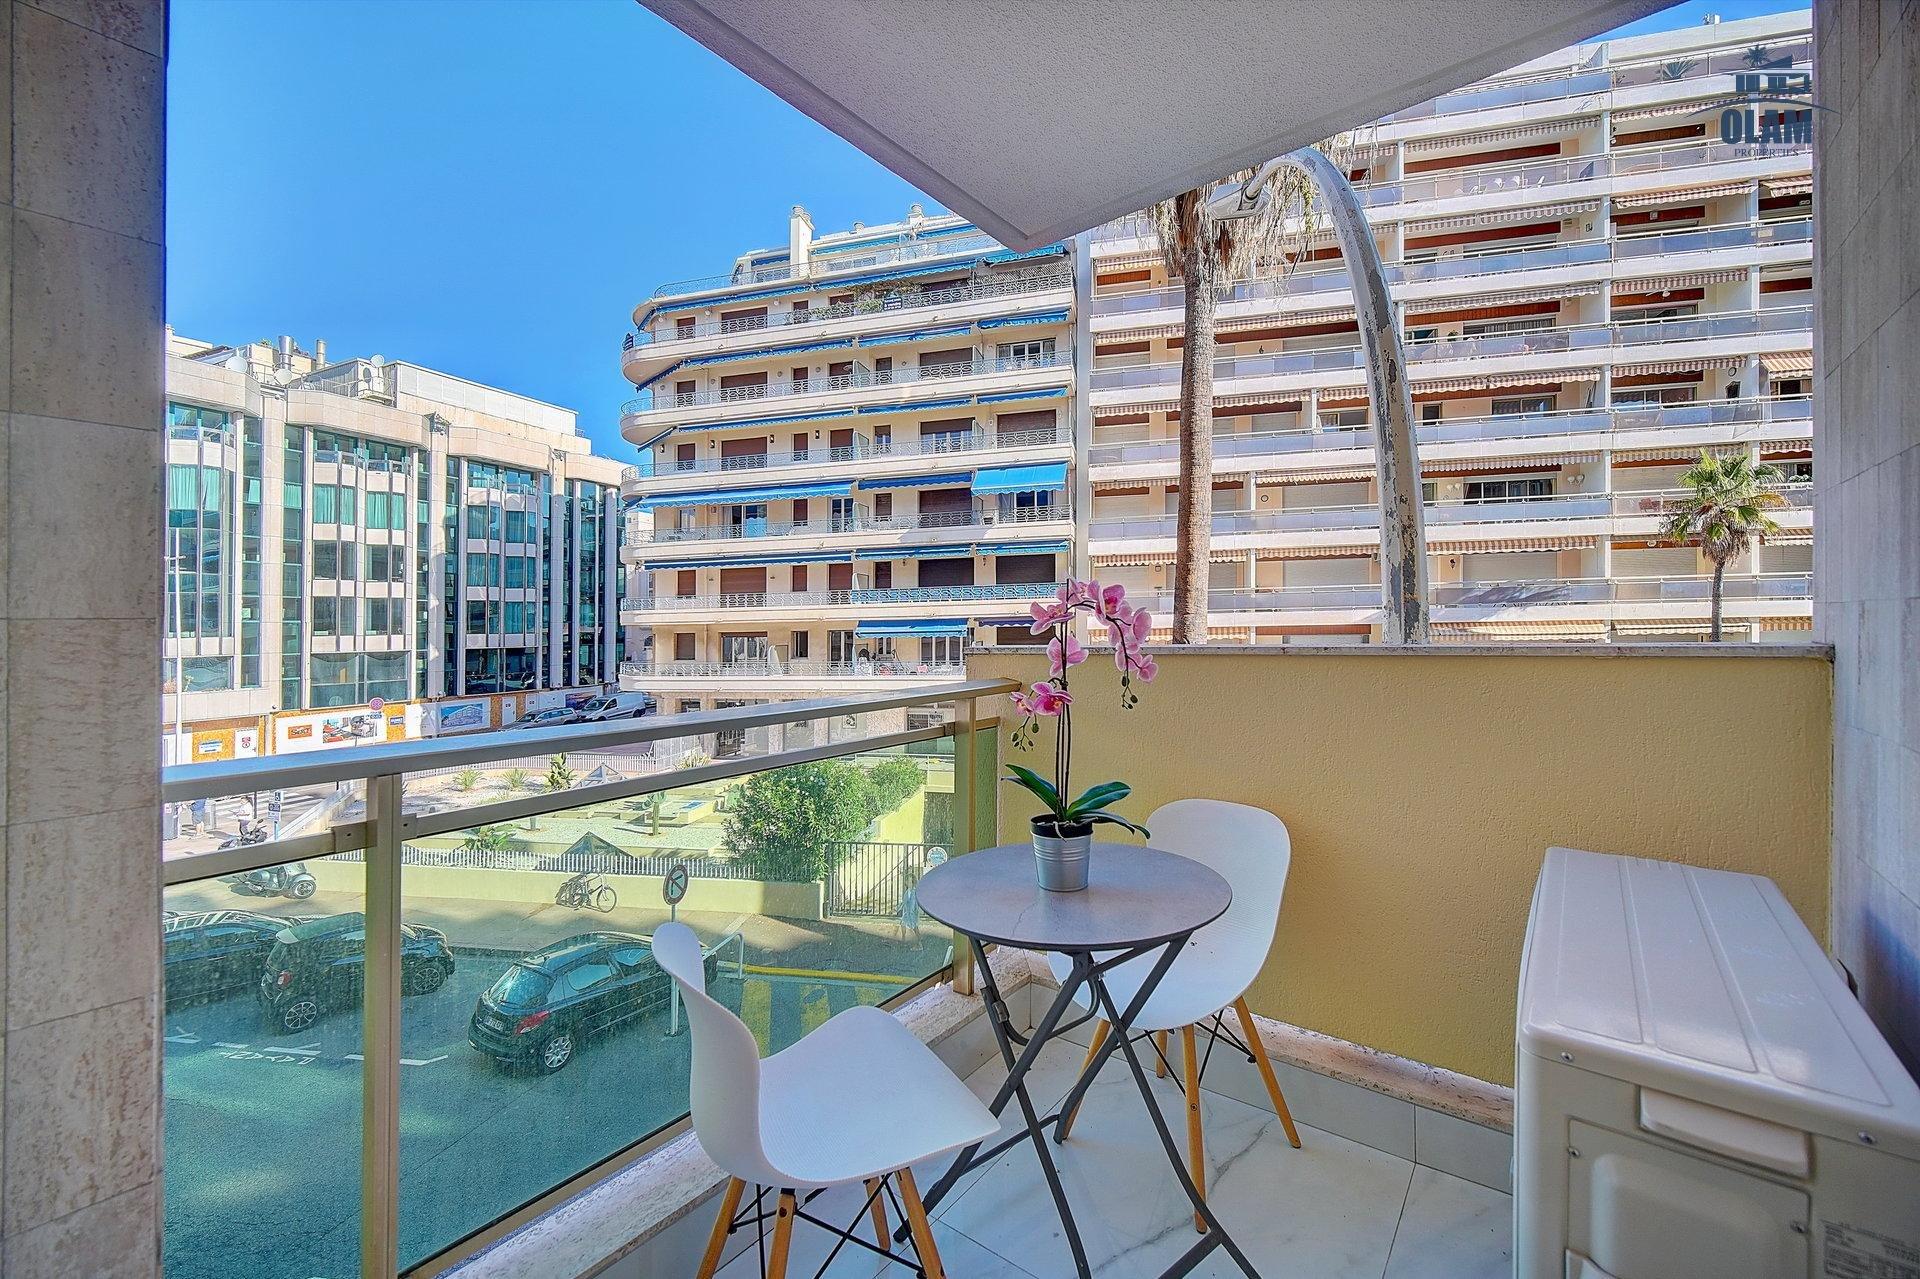 Balcony, Cannes, Croisette, French Riviera, Seasonal rental